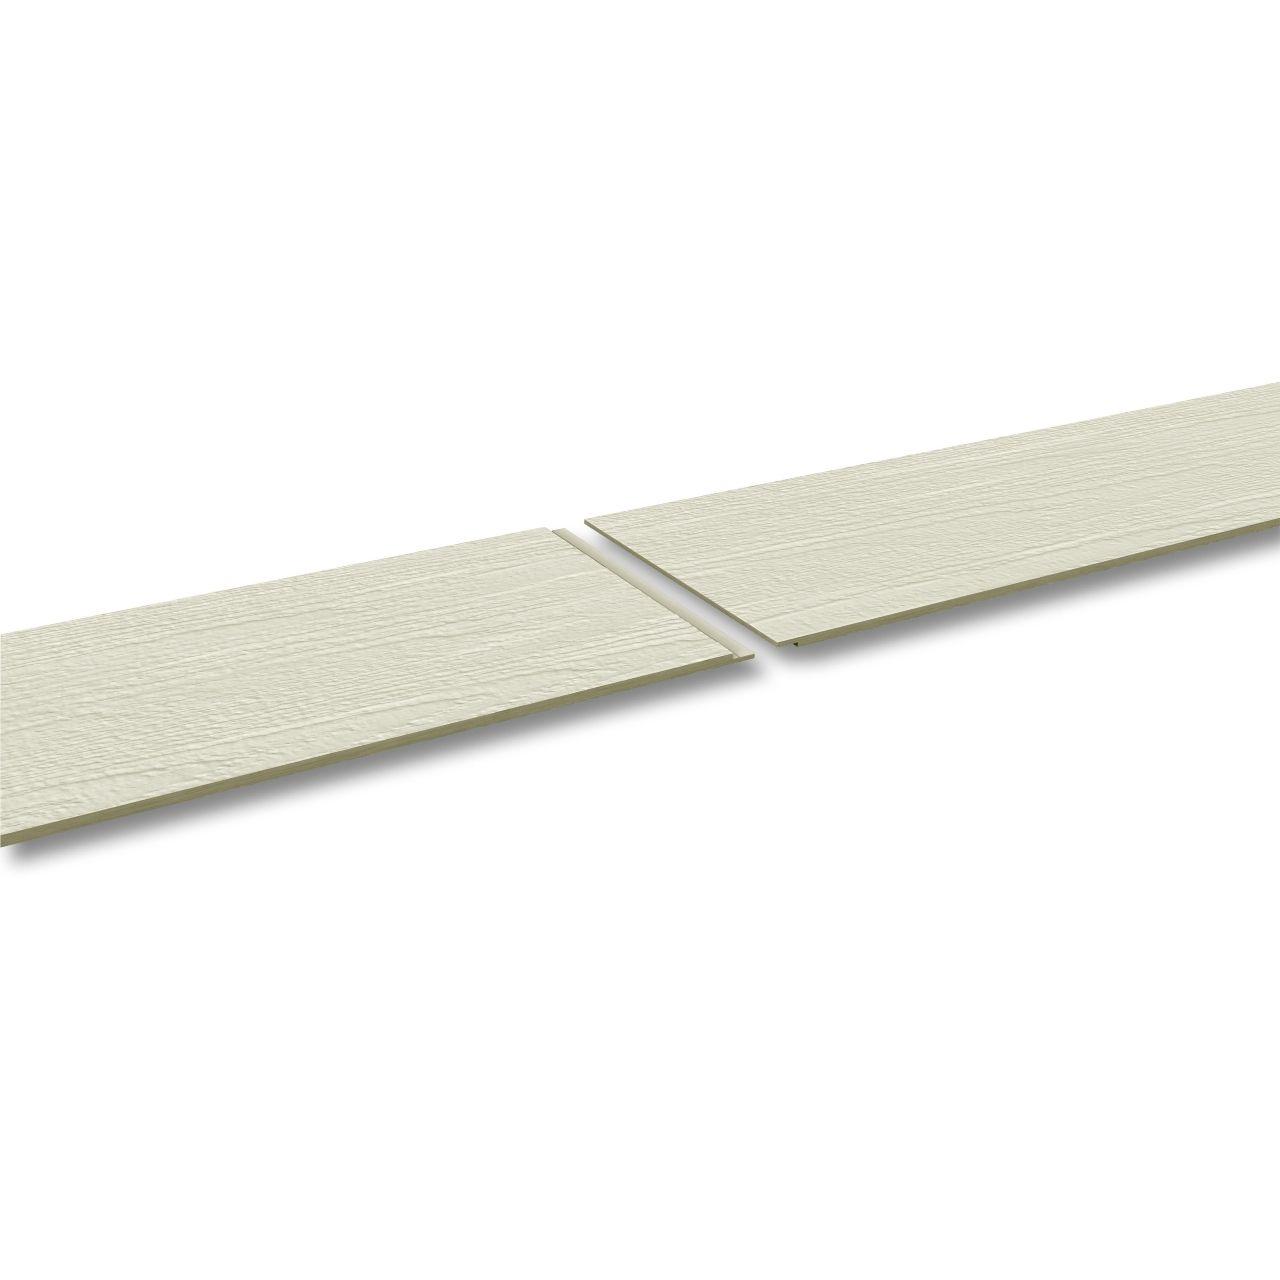 "LP SmartSide ExpertFinish 3/8"" 8"" x 16' 38 Series Cedar Texture Lap Engineered Wood Siding Abyss Black"